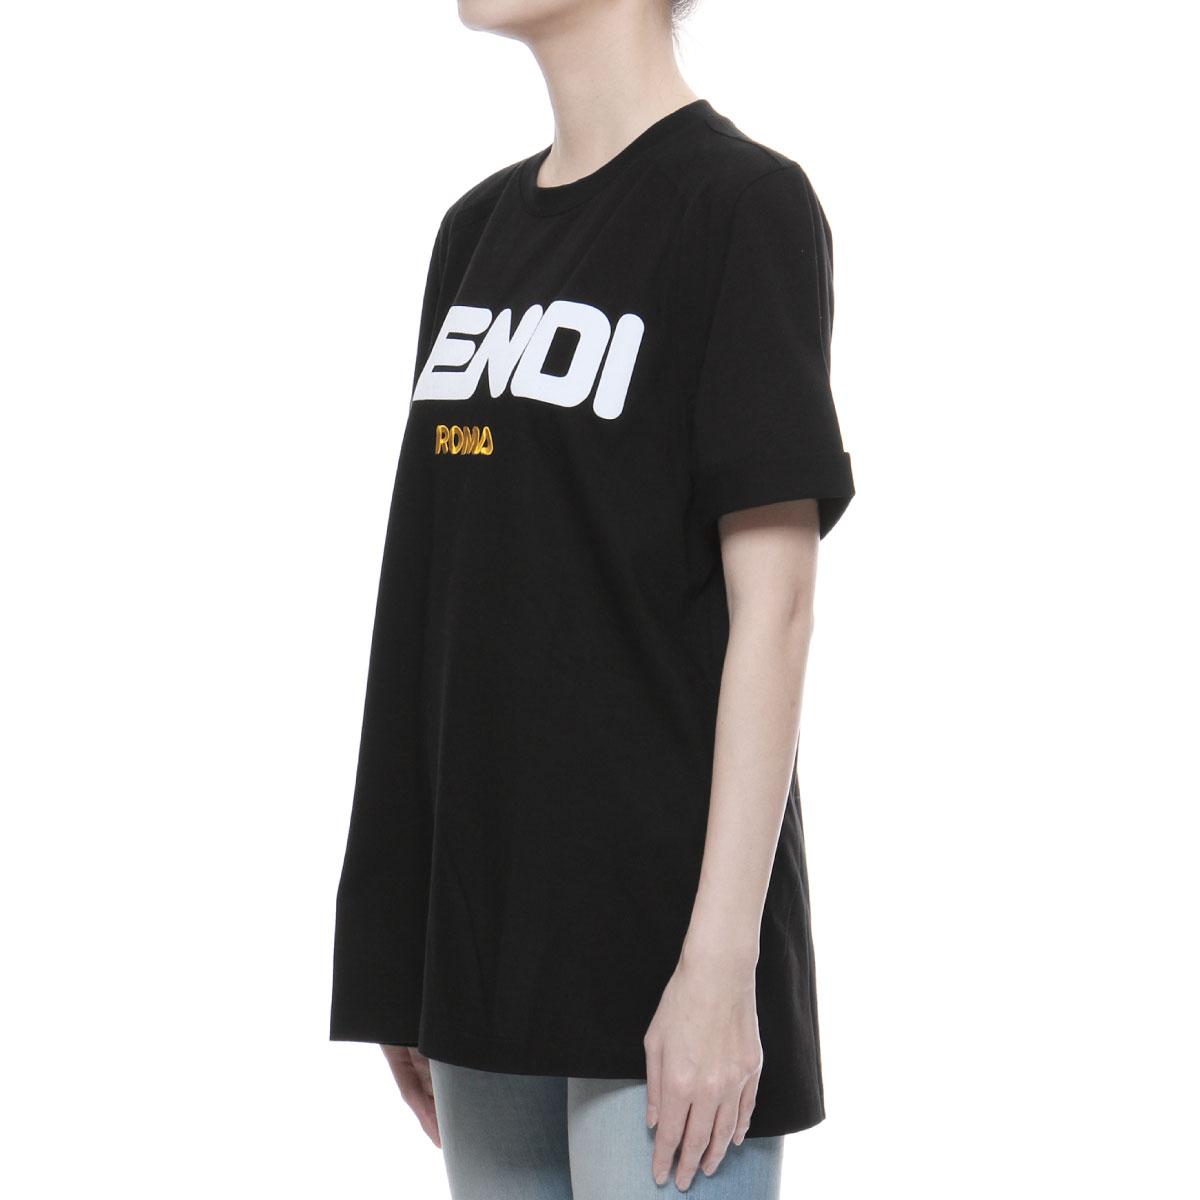 35416cf8d05e importshopdouble  Fendi FENDI T-shirt Lady s FS7074 A5H1 F0GME short ...